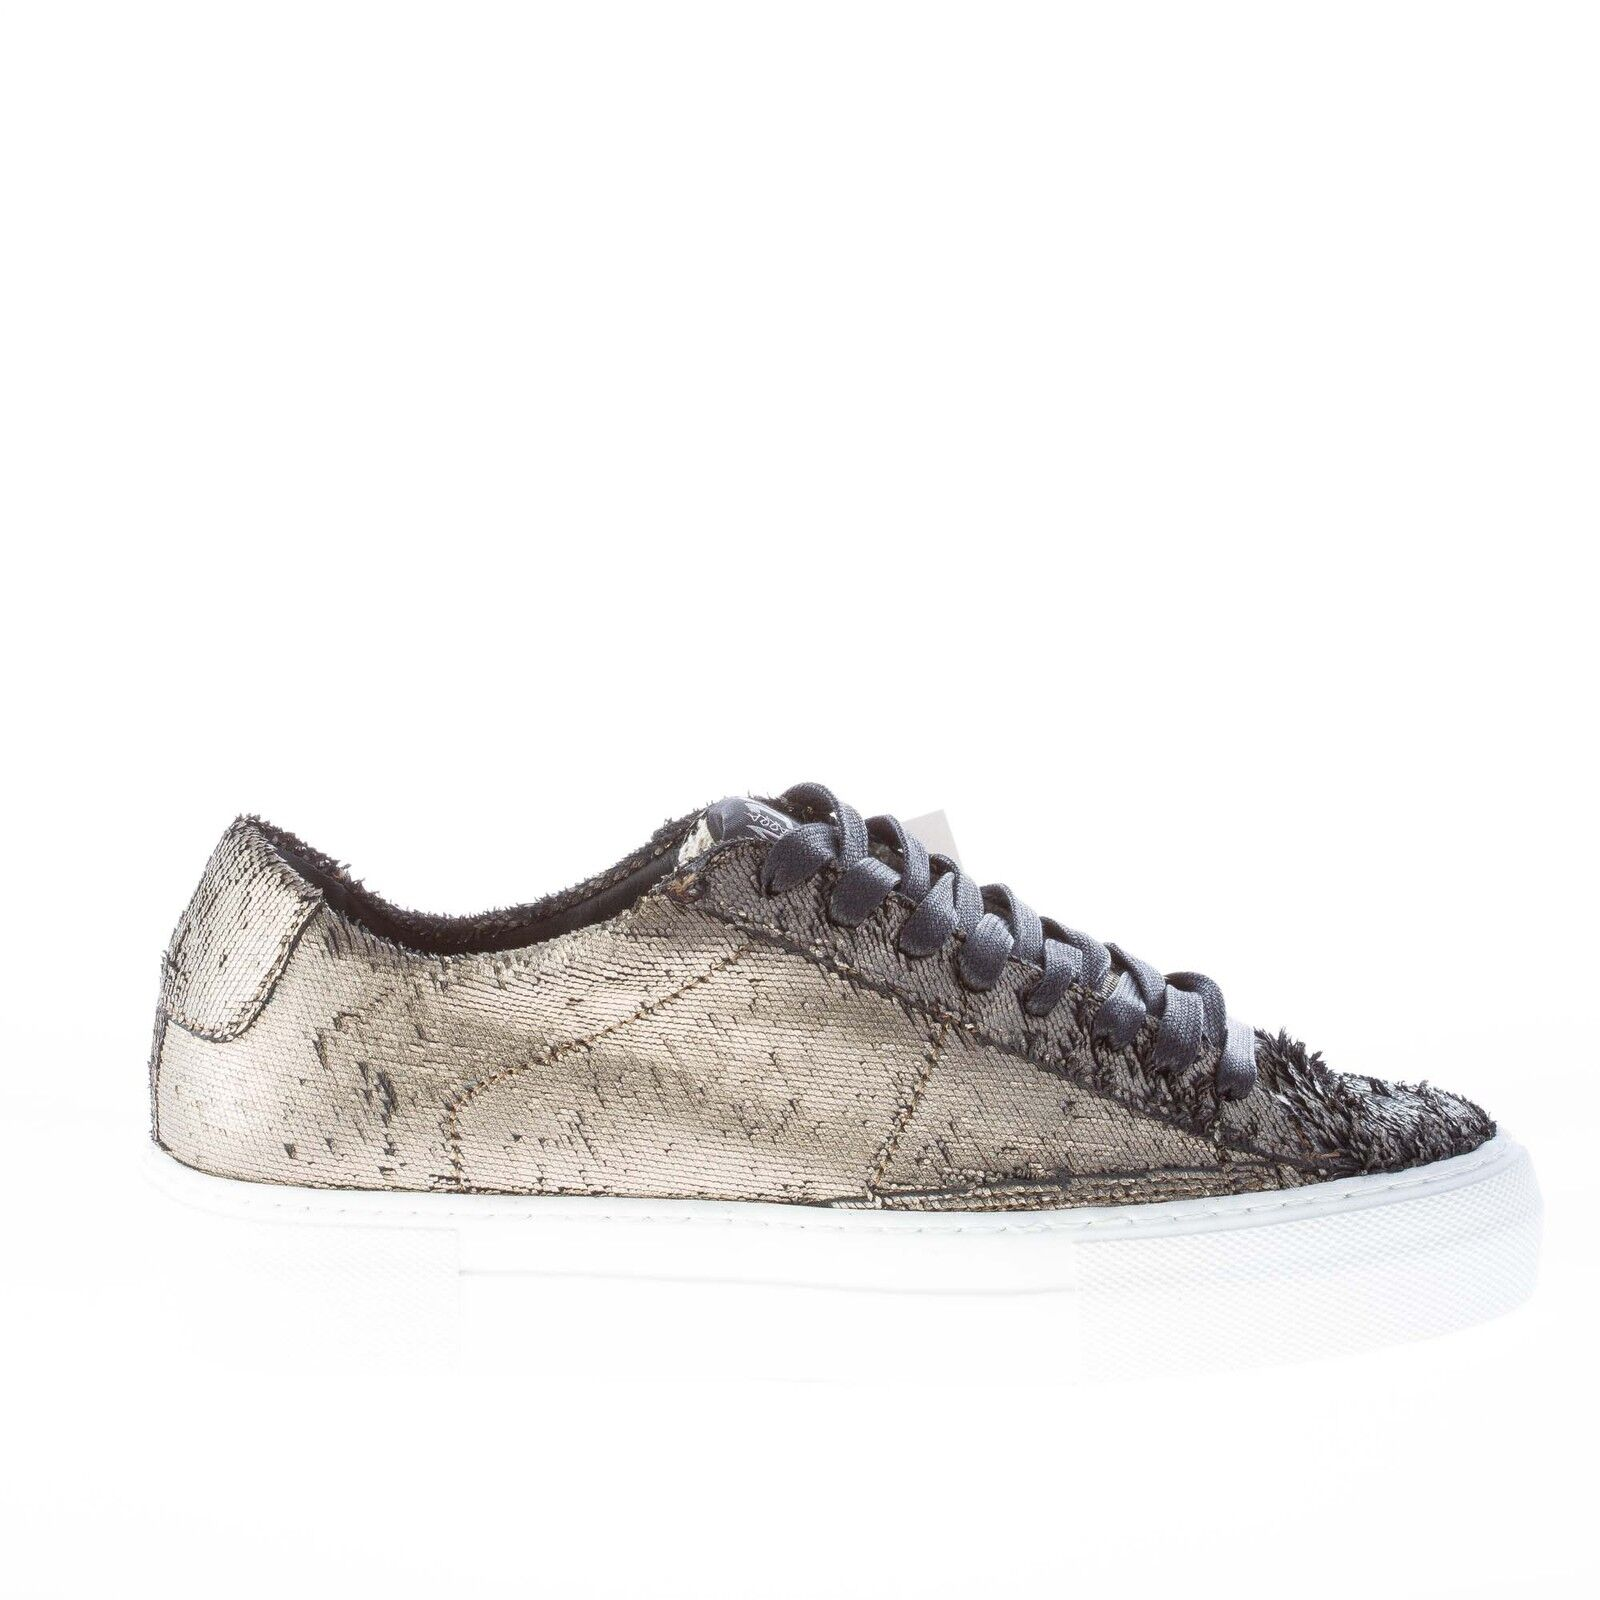 QUBTTROBBRRBDODICI damen schuhe handmade in Italy Platinum laser fabric sneaker